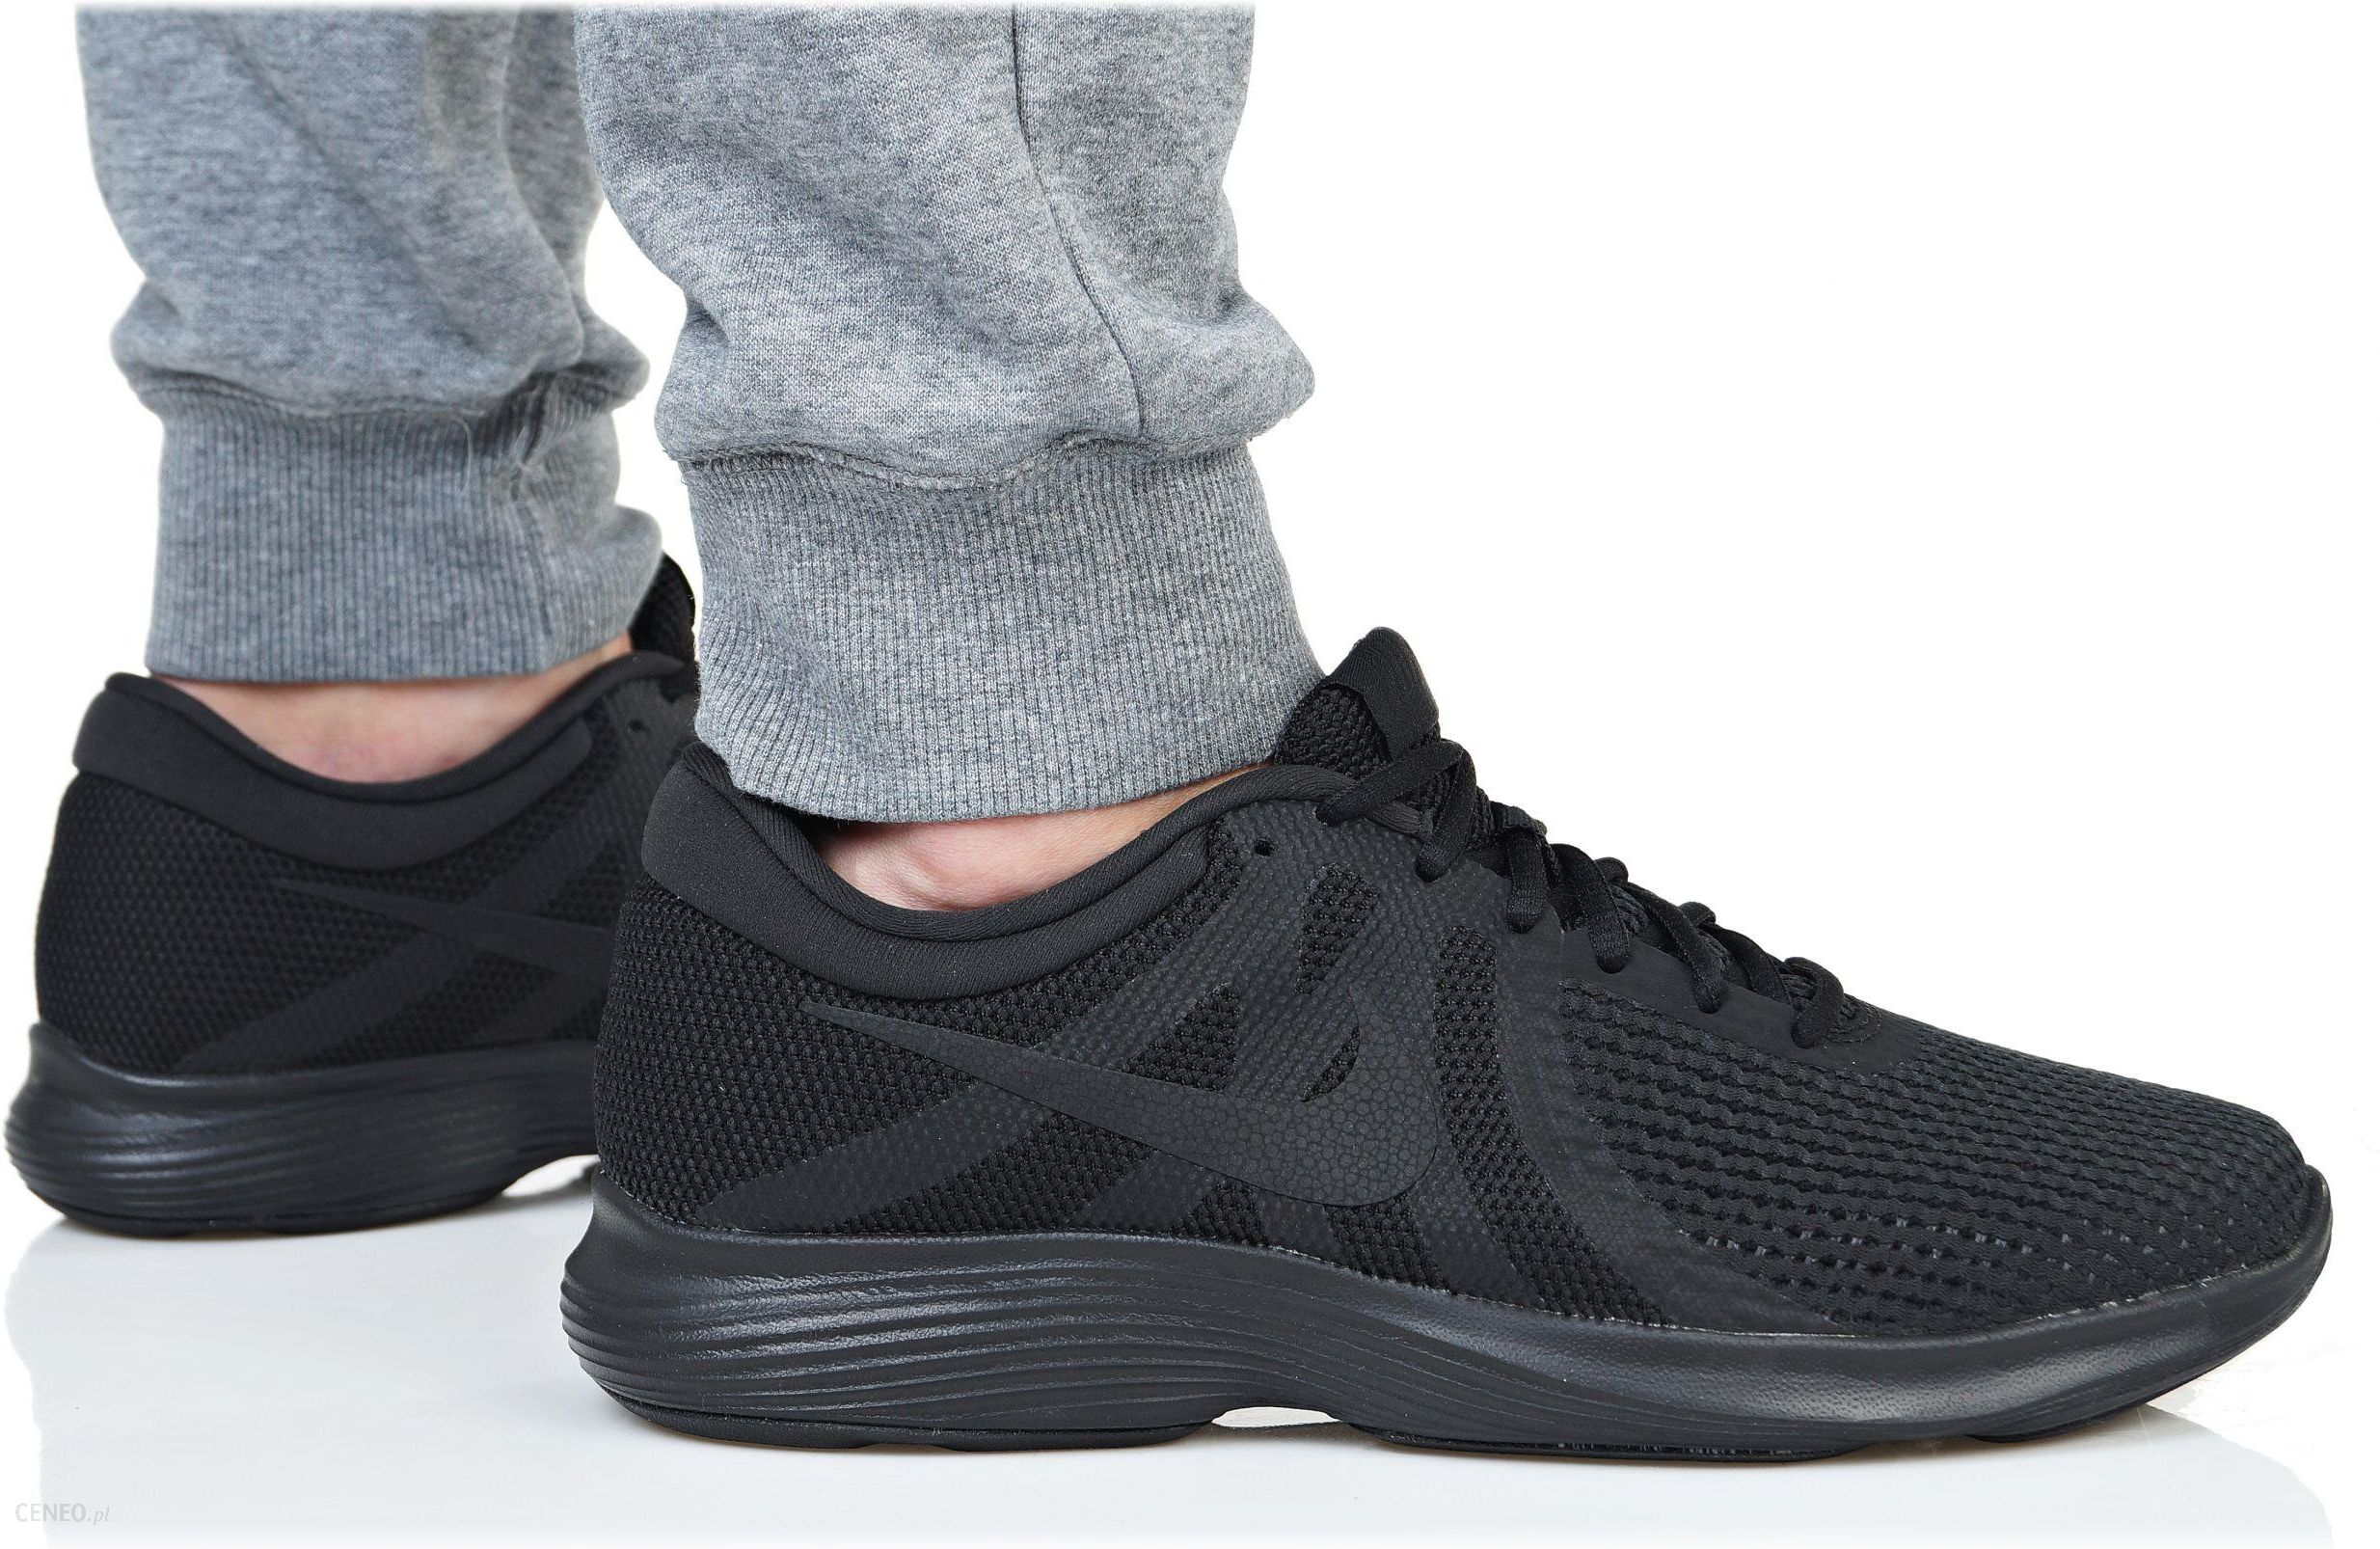 52a2d8f8 I Aj3490 002 Nike 4 Opinie Eu Buty Czarne Męskie Ceny Revolution wZXYYqz